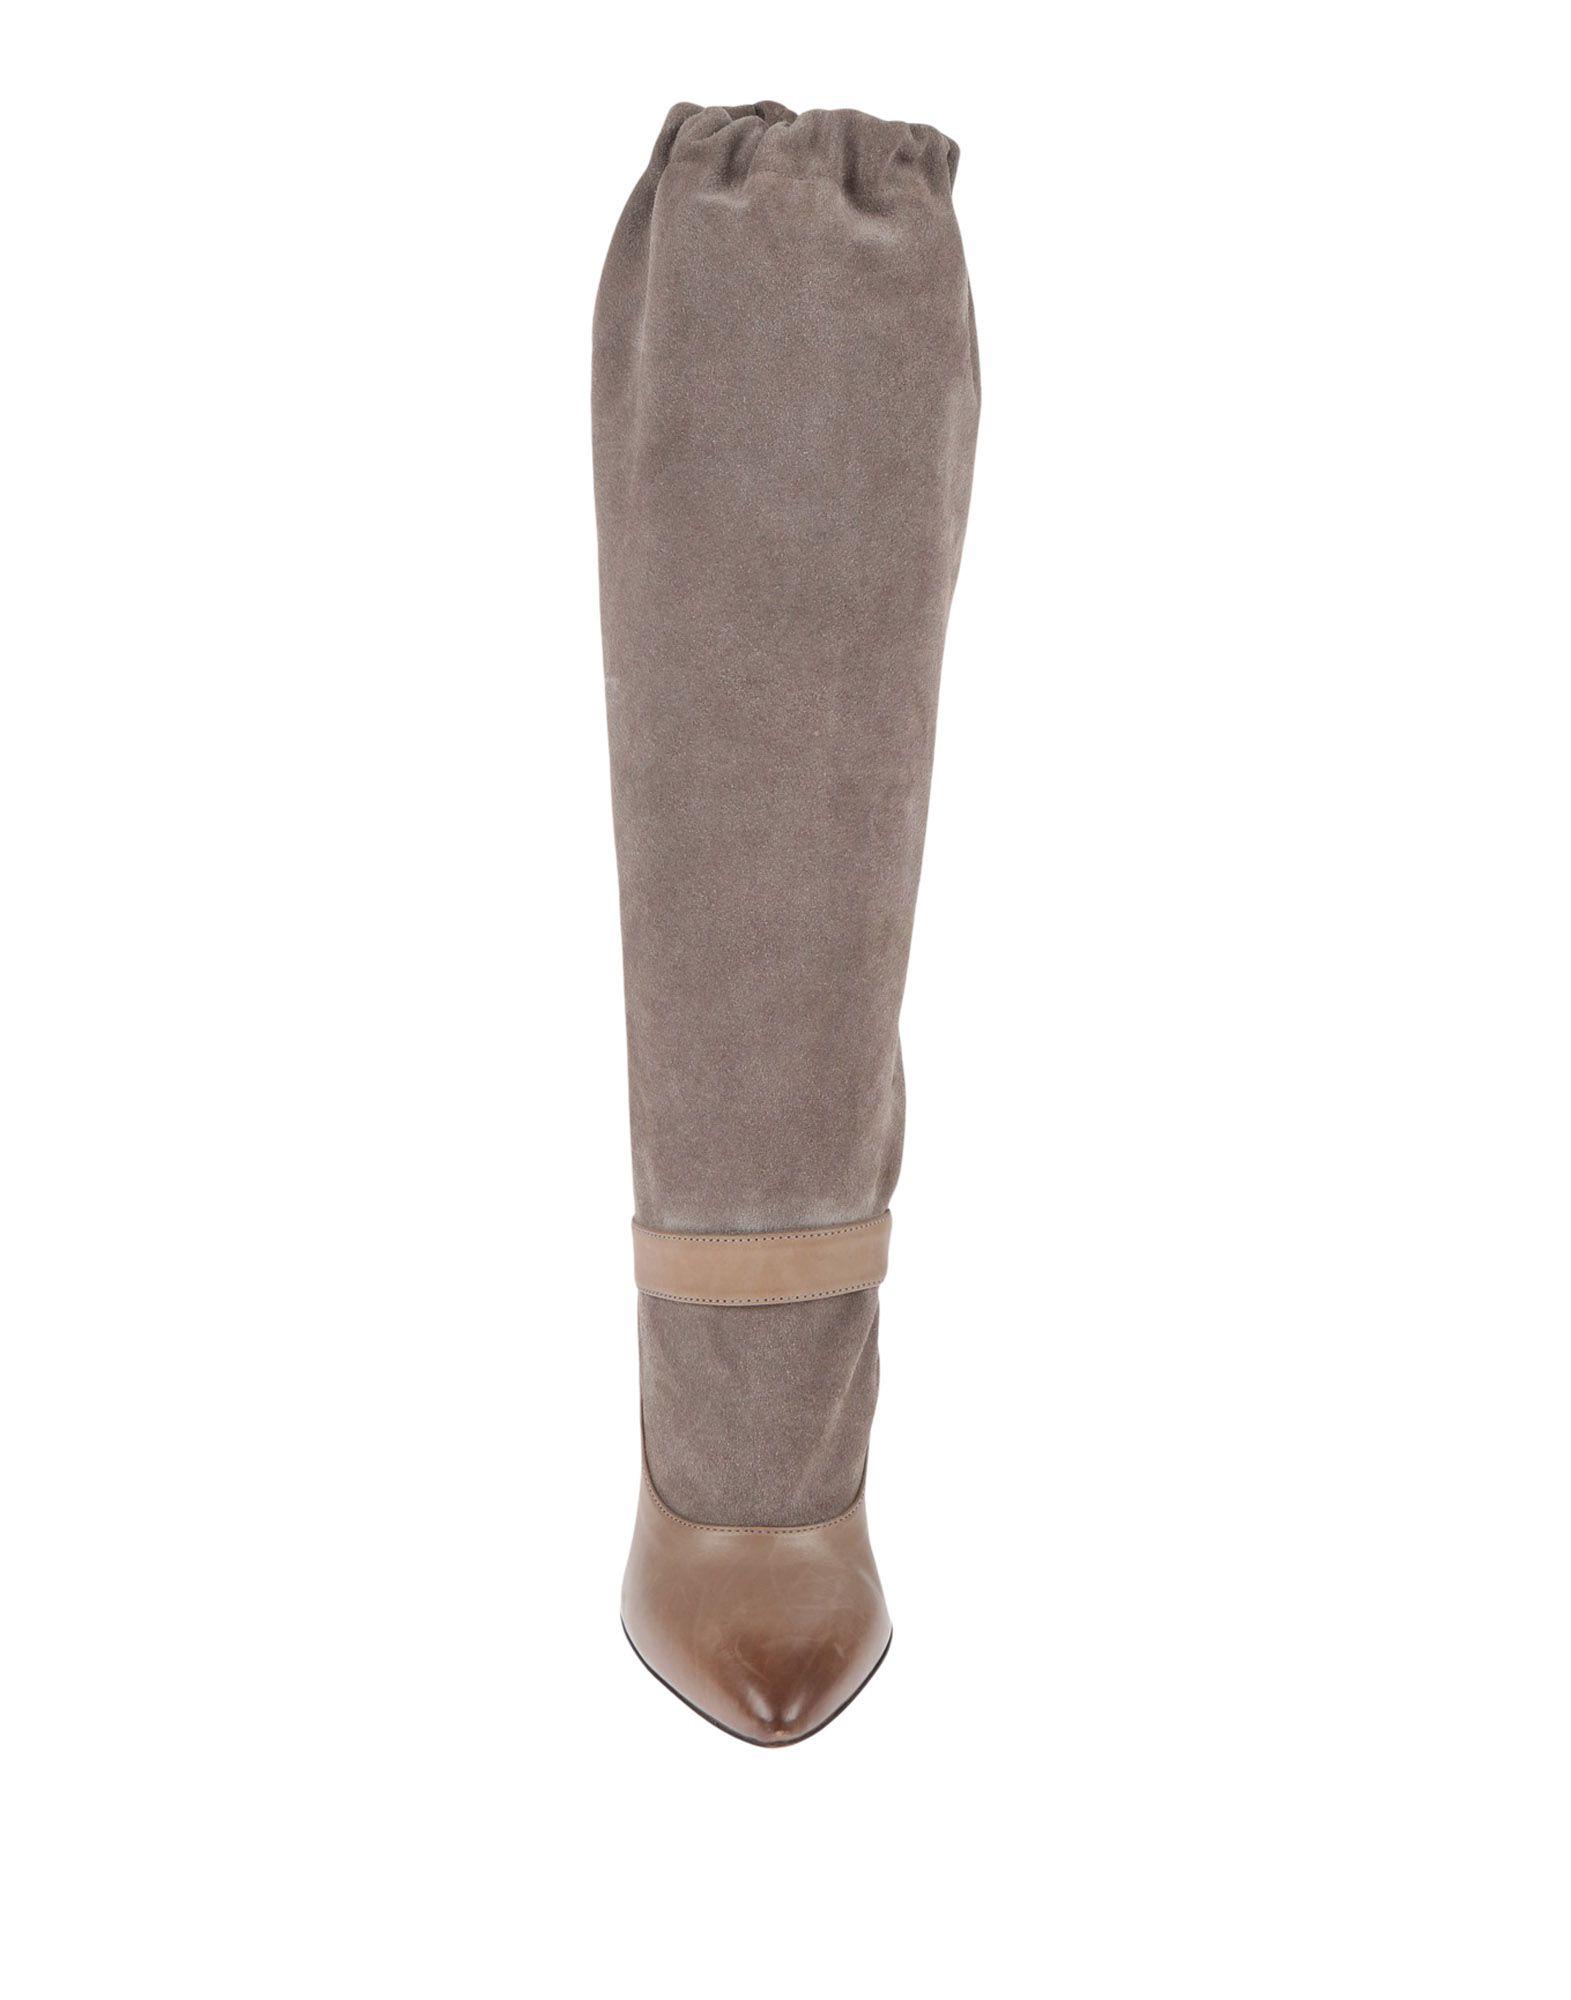 Maison Margiela Stiefel Damen  Schuhe 11529360KWGünstige gut aussehende Schuhe  00e0e4